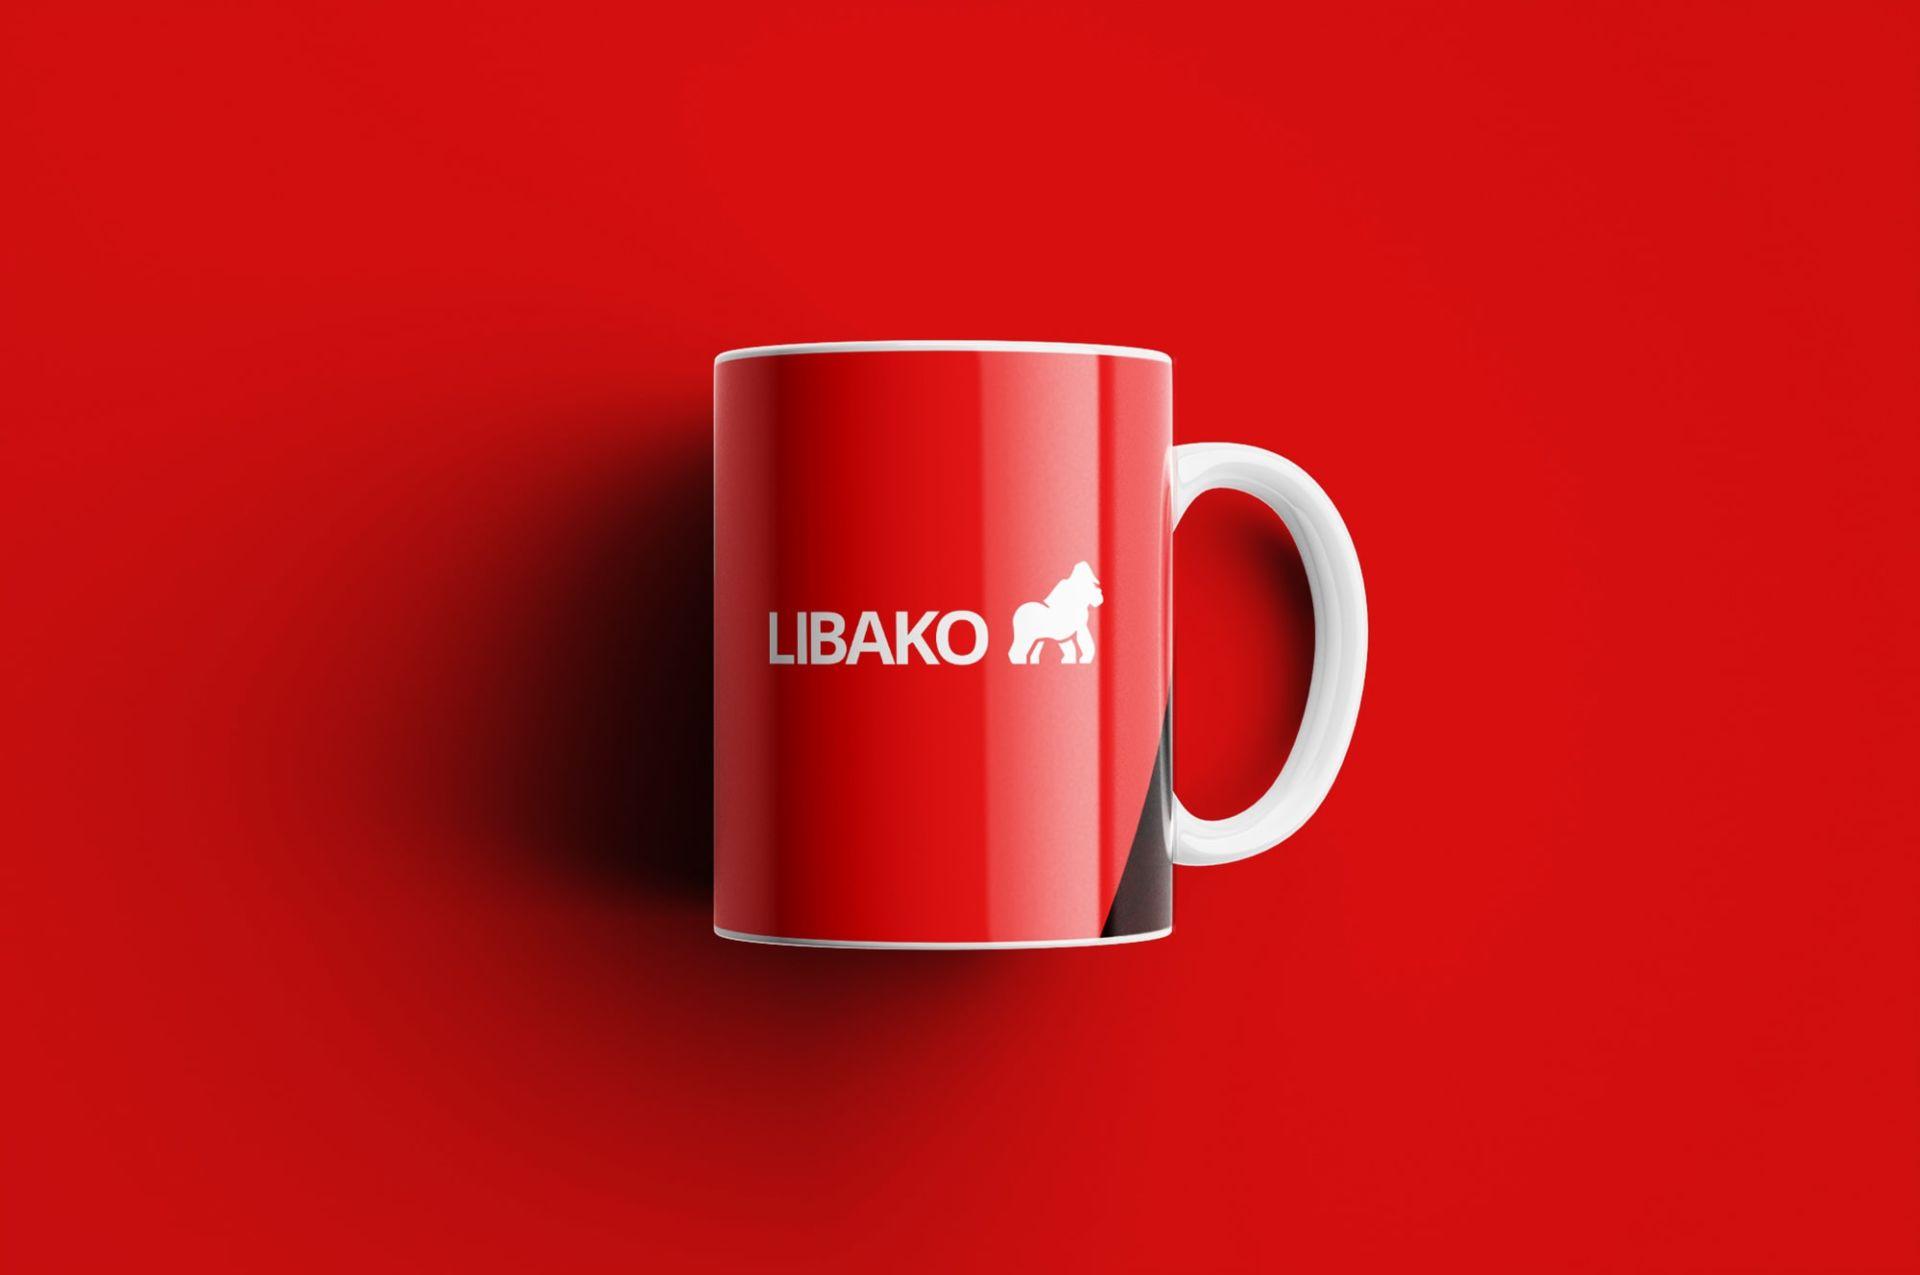 LIBAKO_Mug_Mockup_3